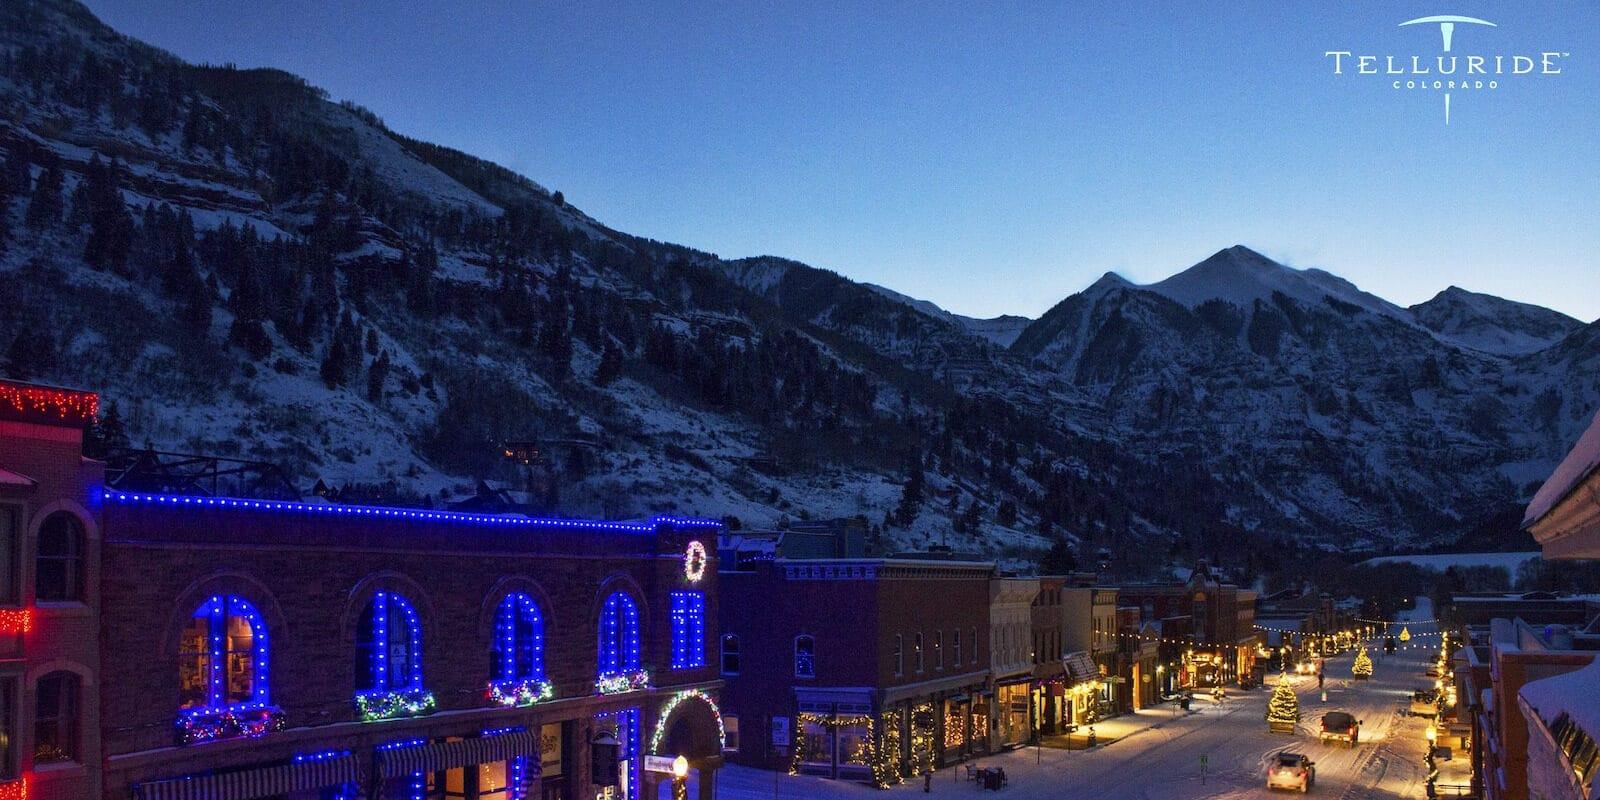 Image of lights in Telluride, Colorado